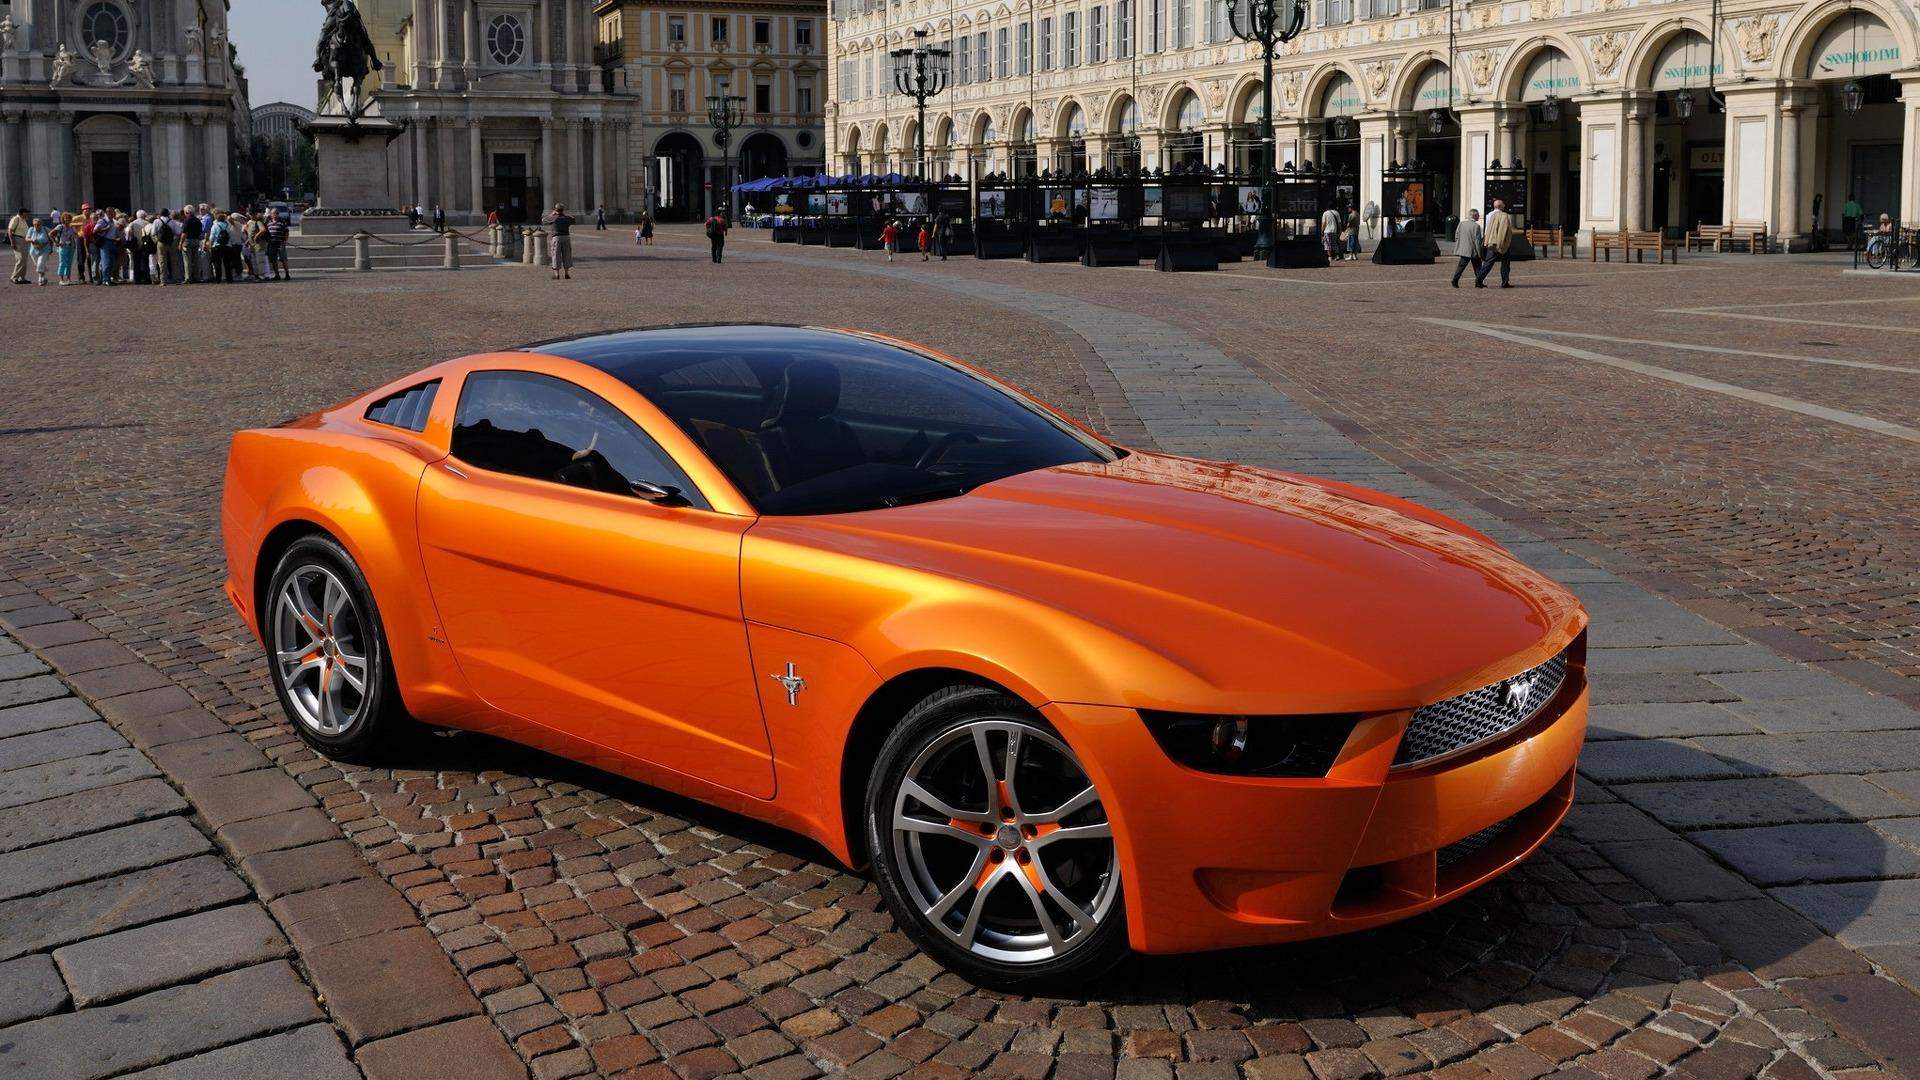 2006-ford-mustang-giugiaro-concept (1)